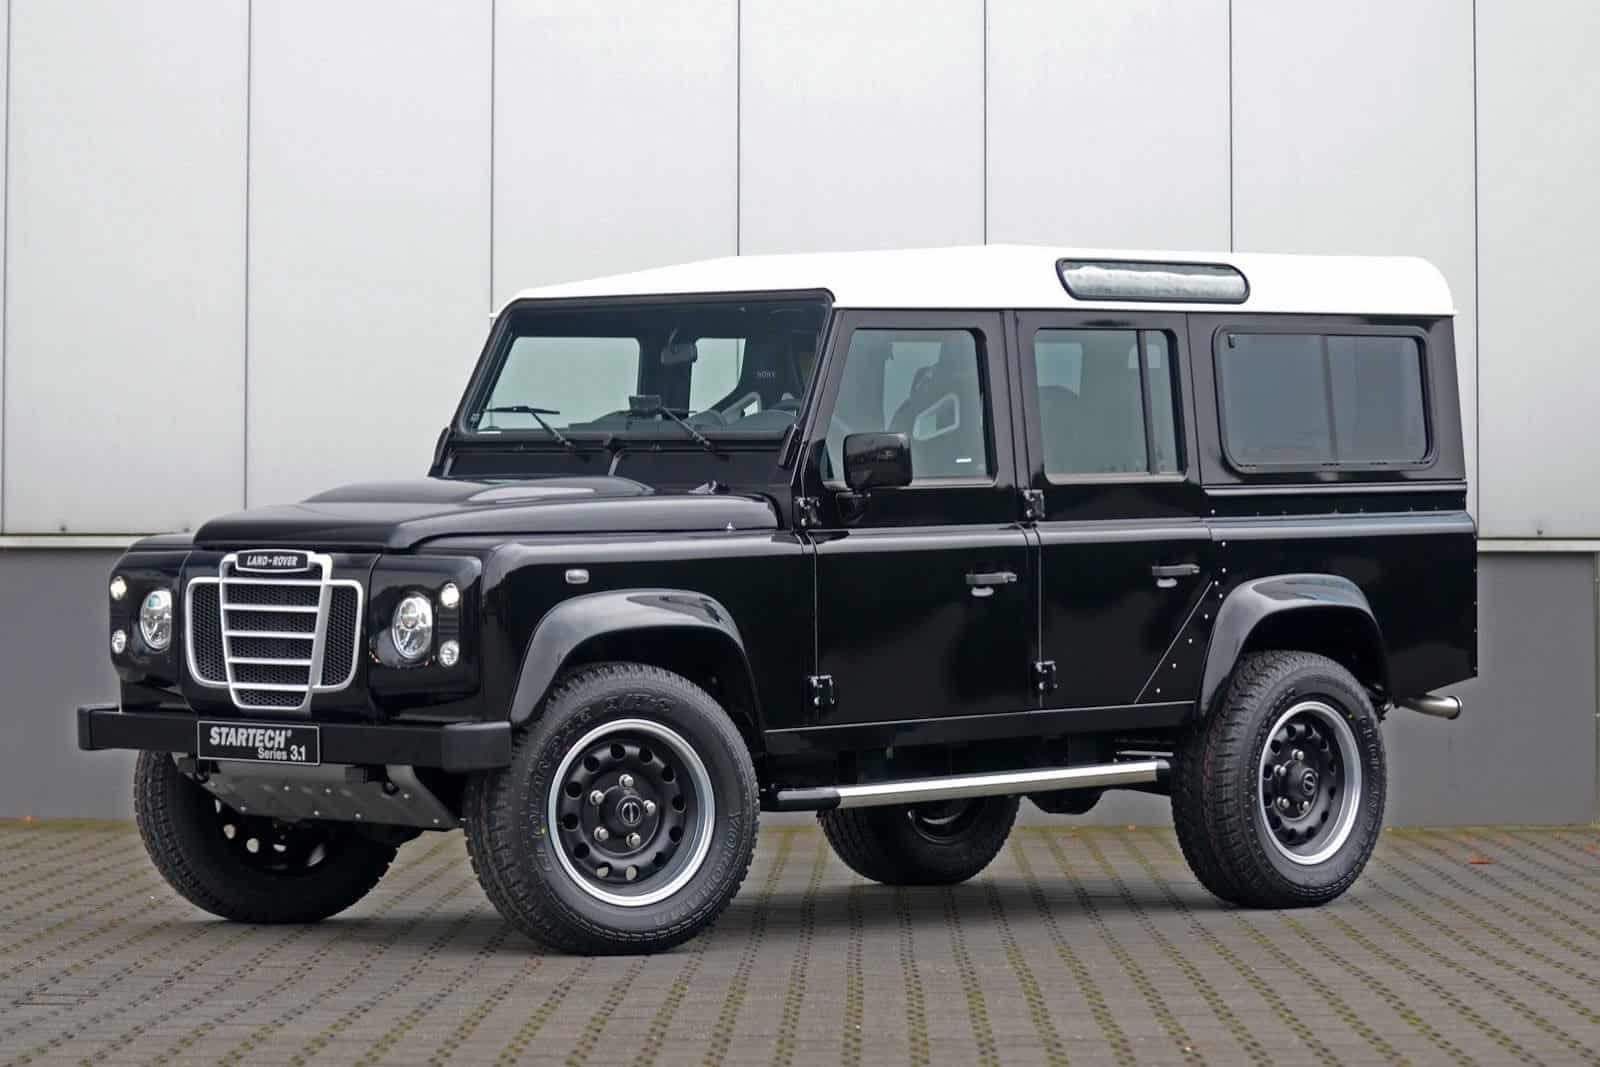 Startech-Land-Rover-Defender-Series-3.1-1